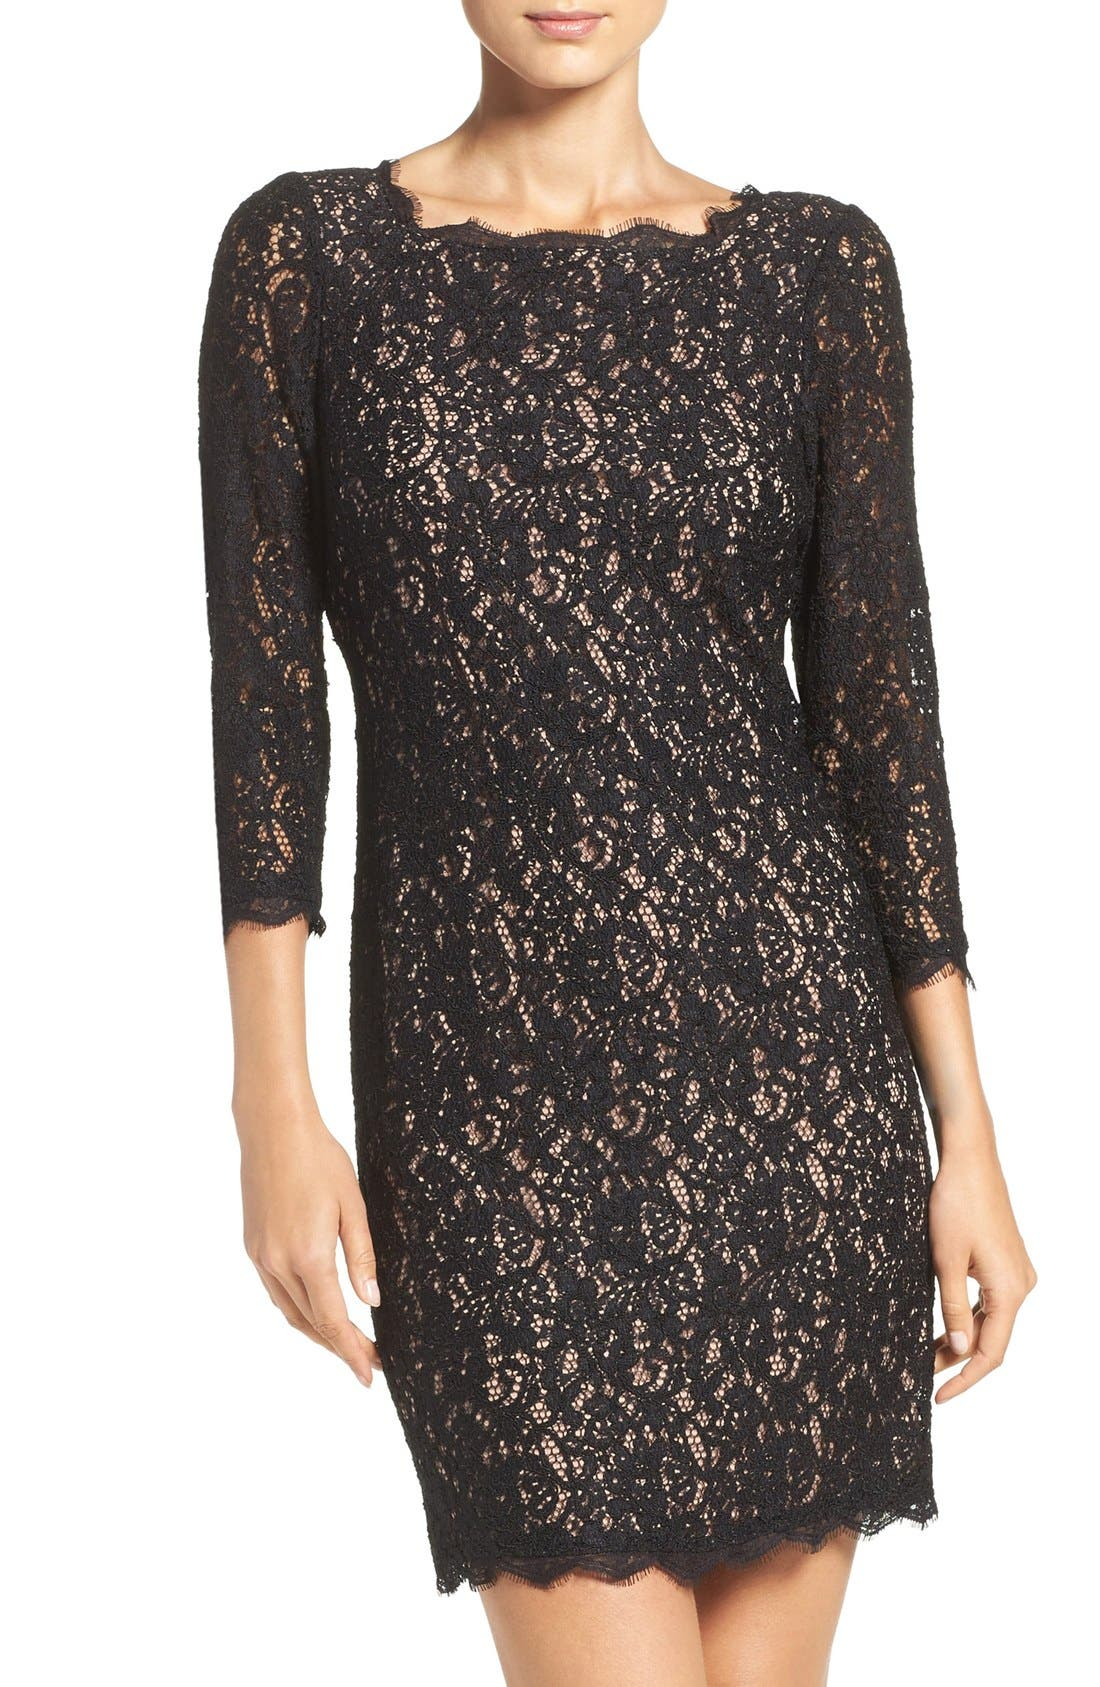 Lace Overlay Sheath Dress